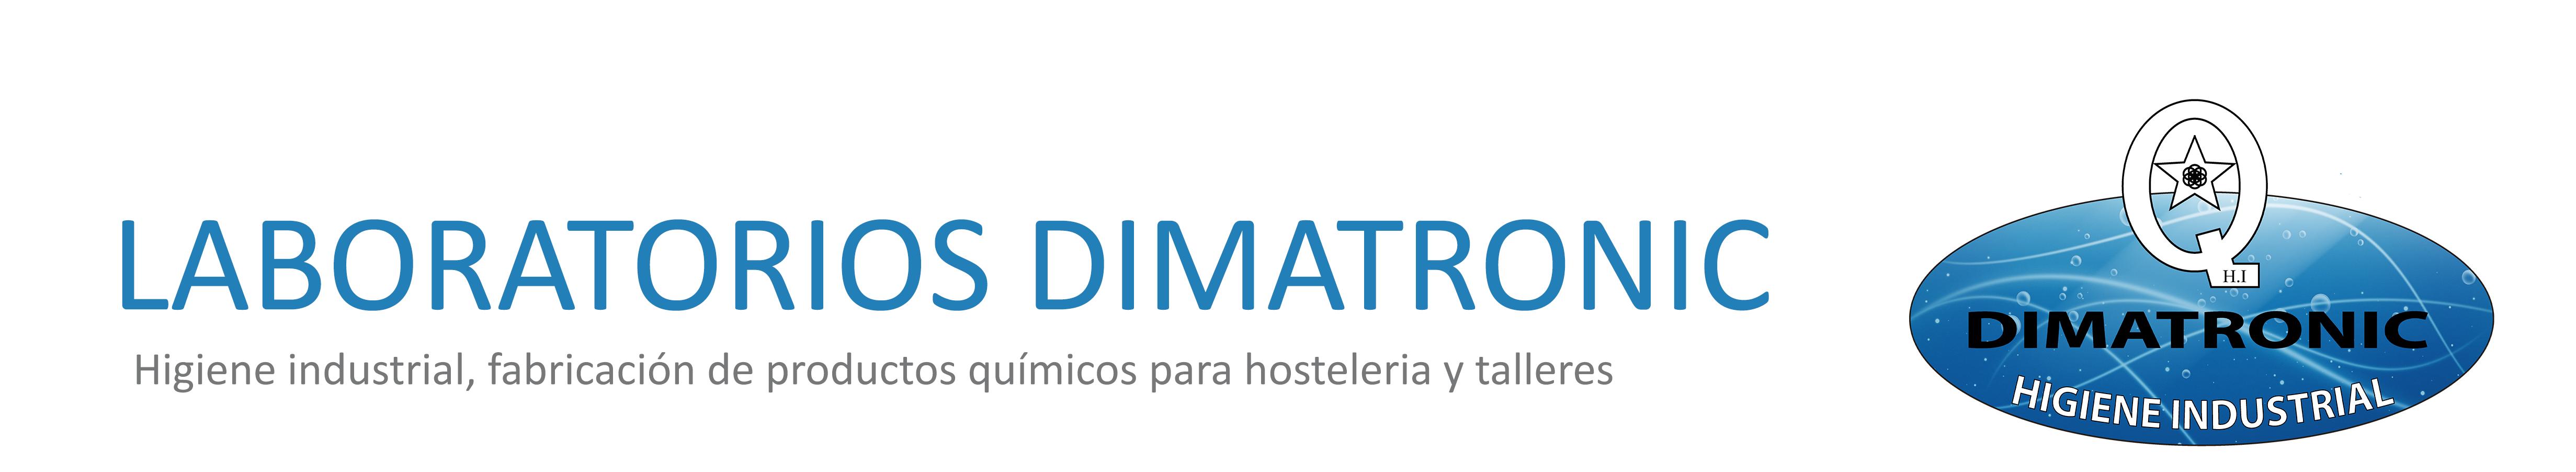 Laboratorios Dimatronic